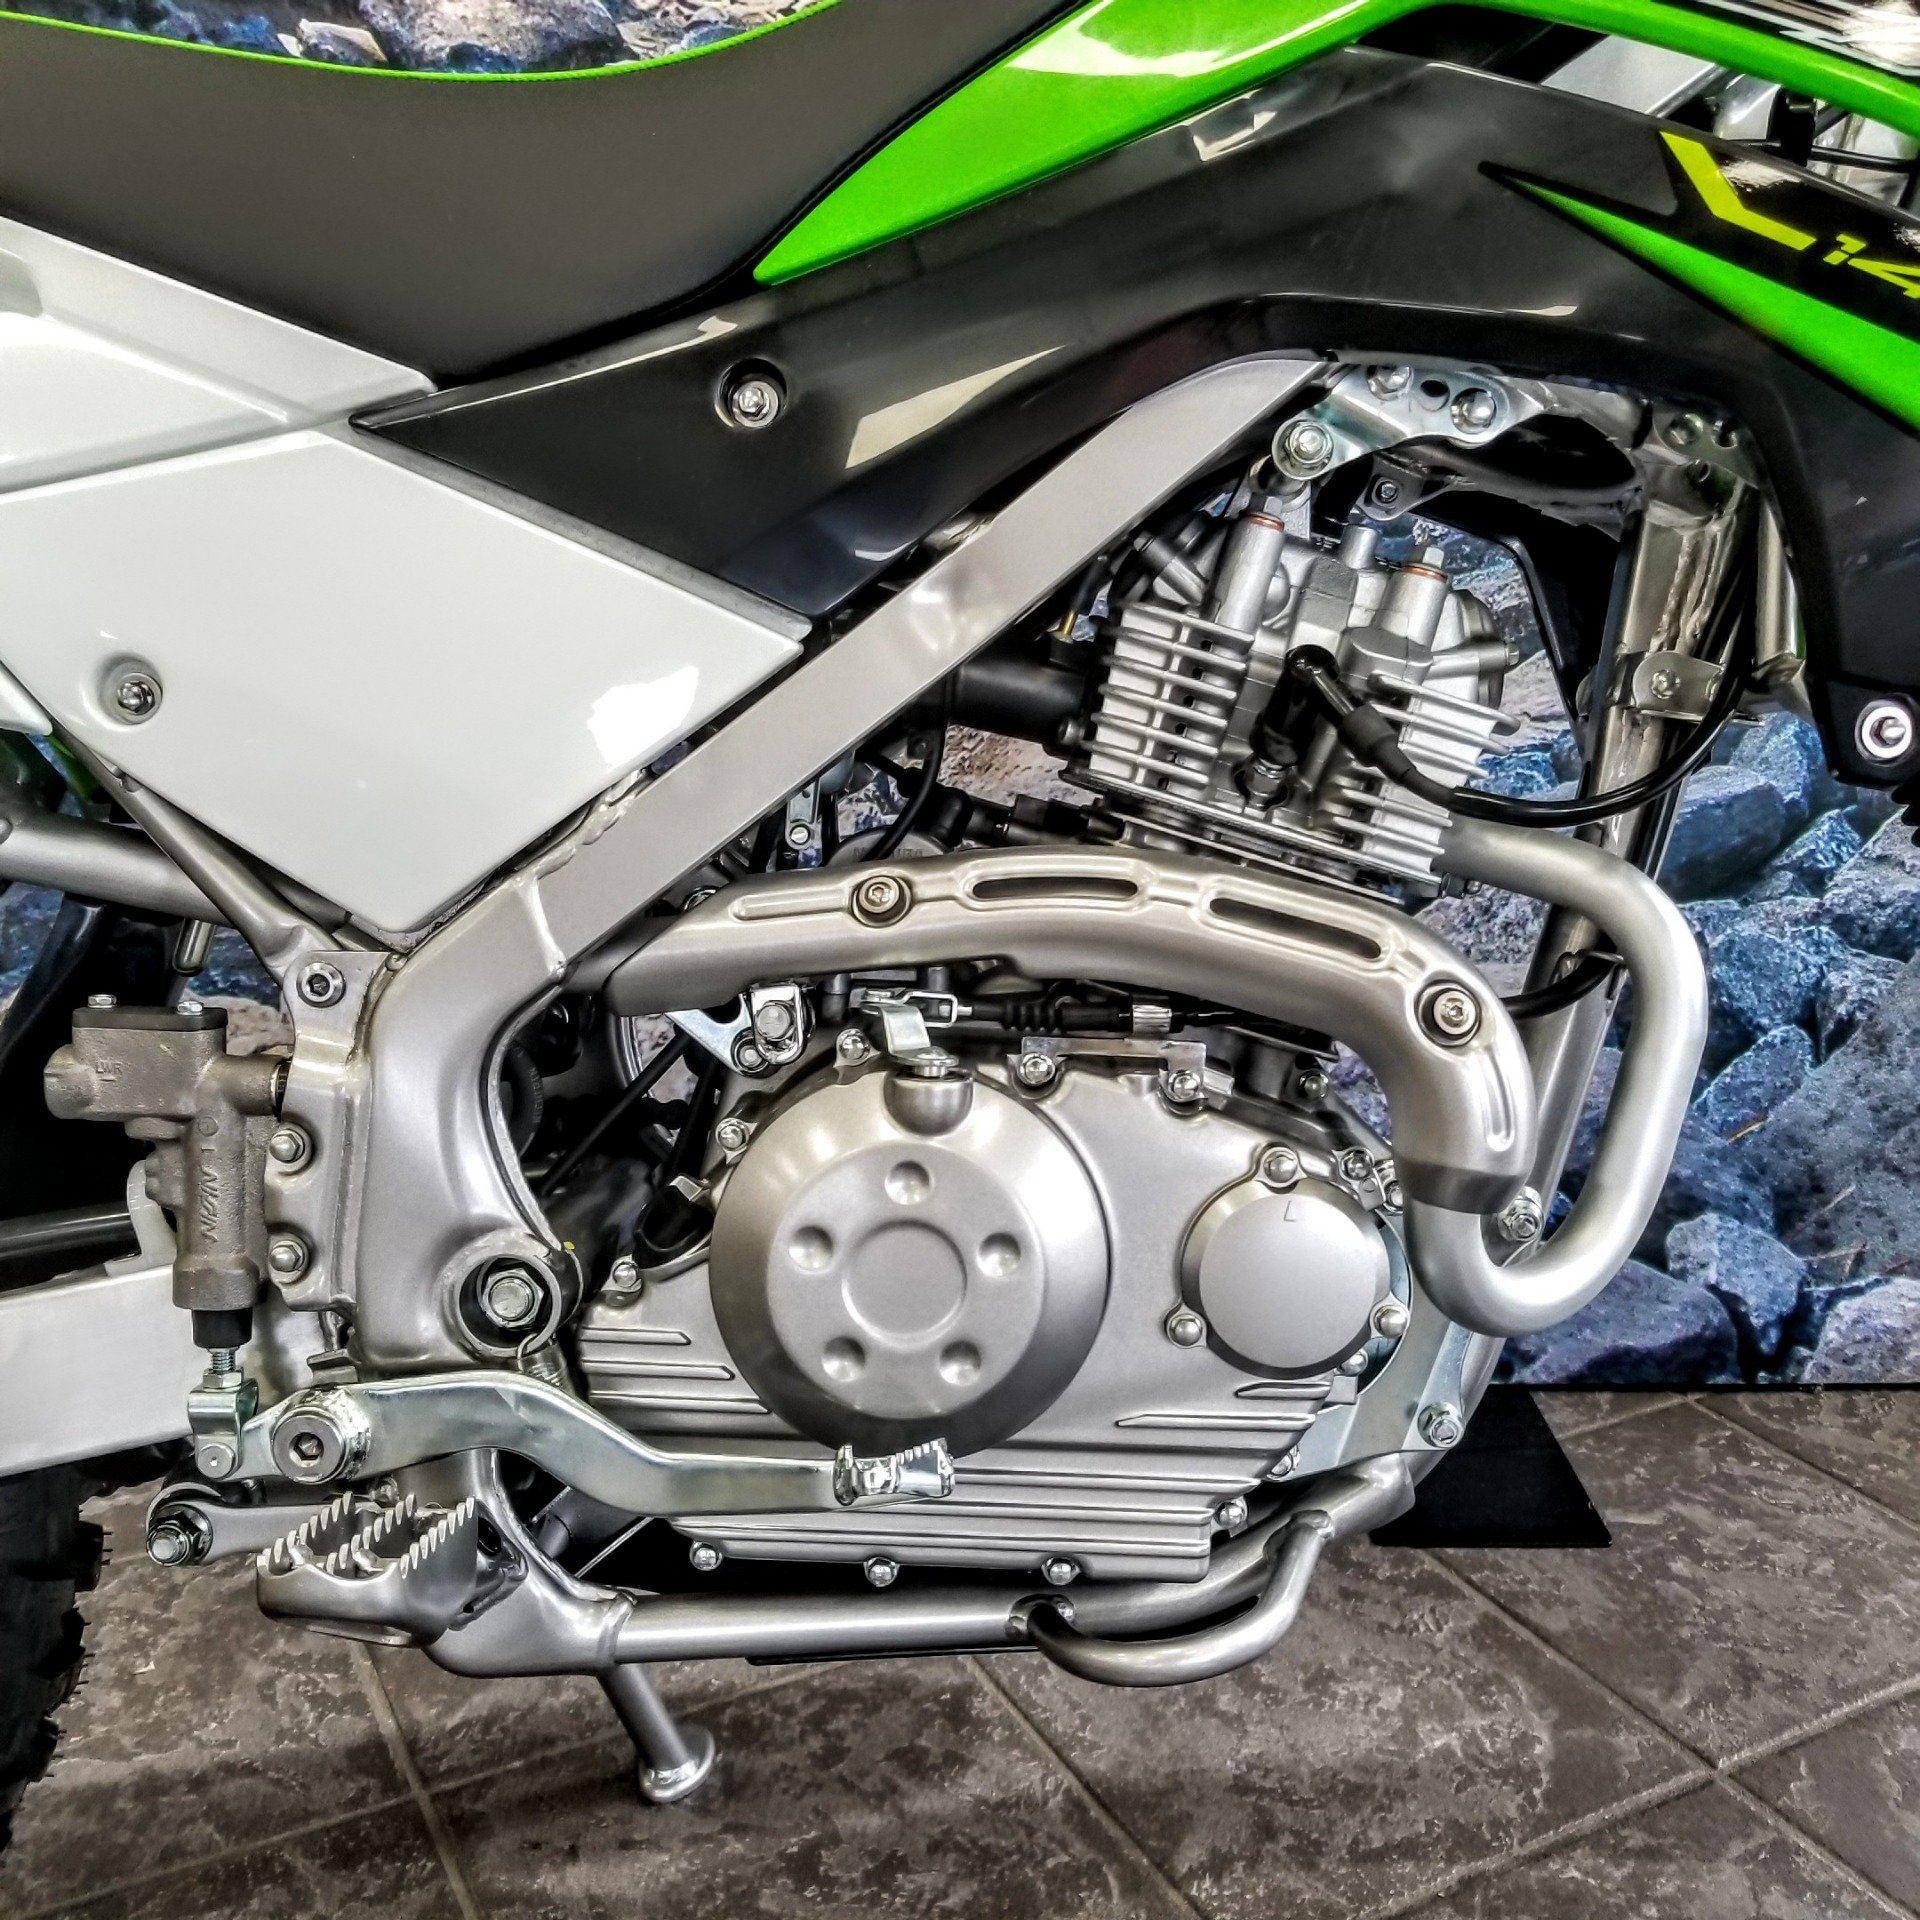 New 2019 Kawasaki Klx 140l Motorcycles In Hickory Nc Stock Number Wiring Harness North Carolina